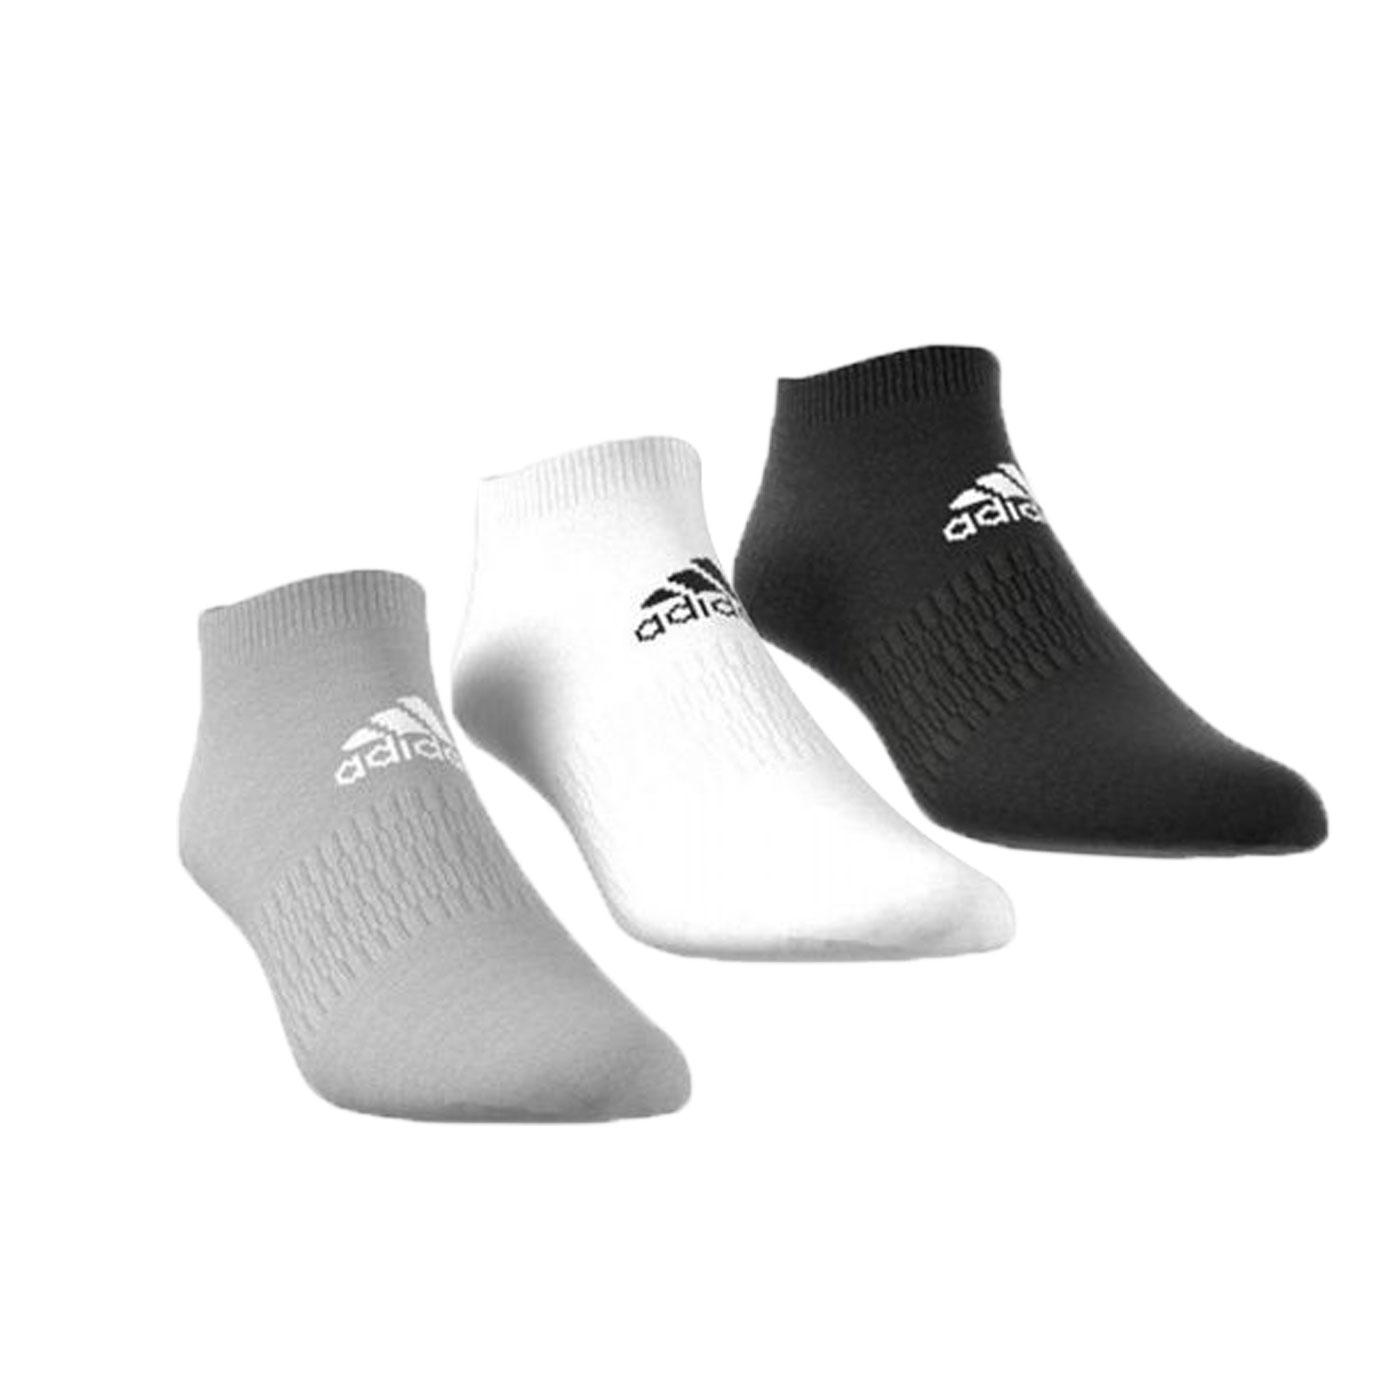 ADIDAS 運動踝襪(三雙入) DZ9400 - 黑灰白